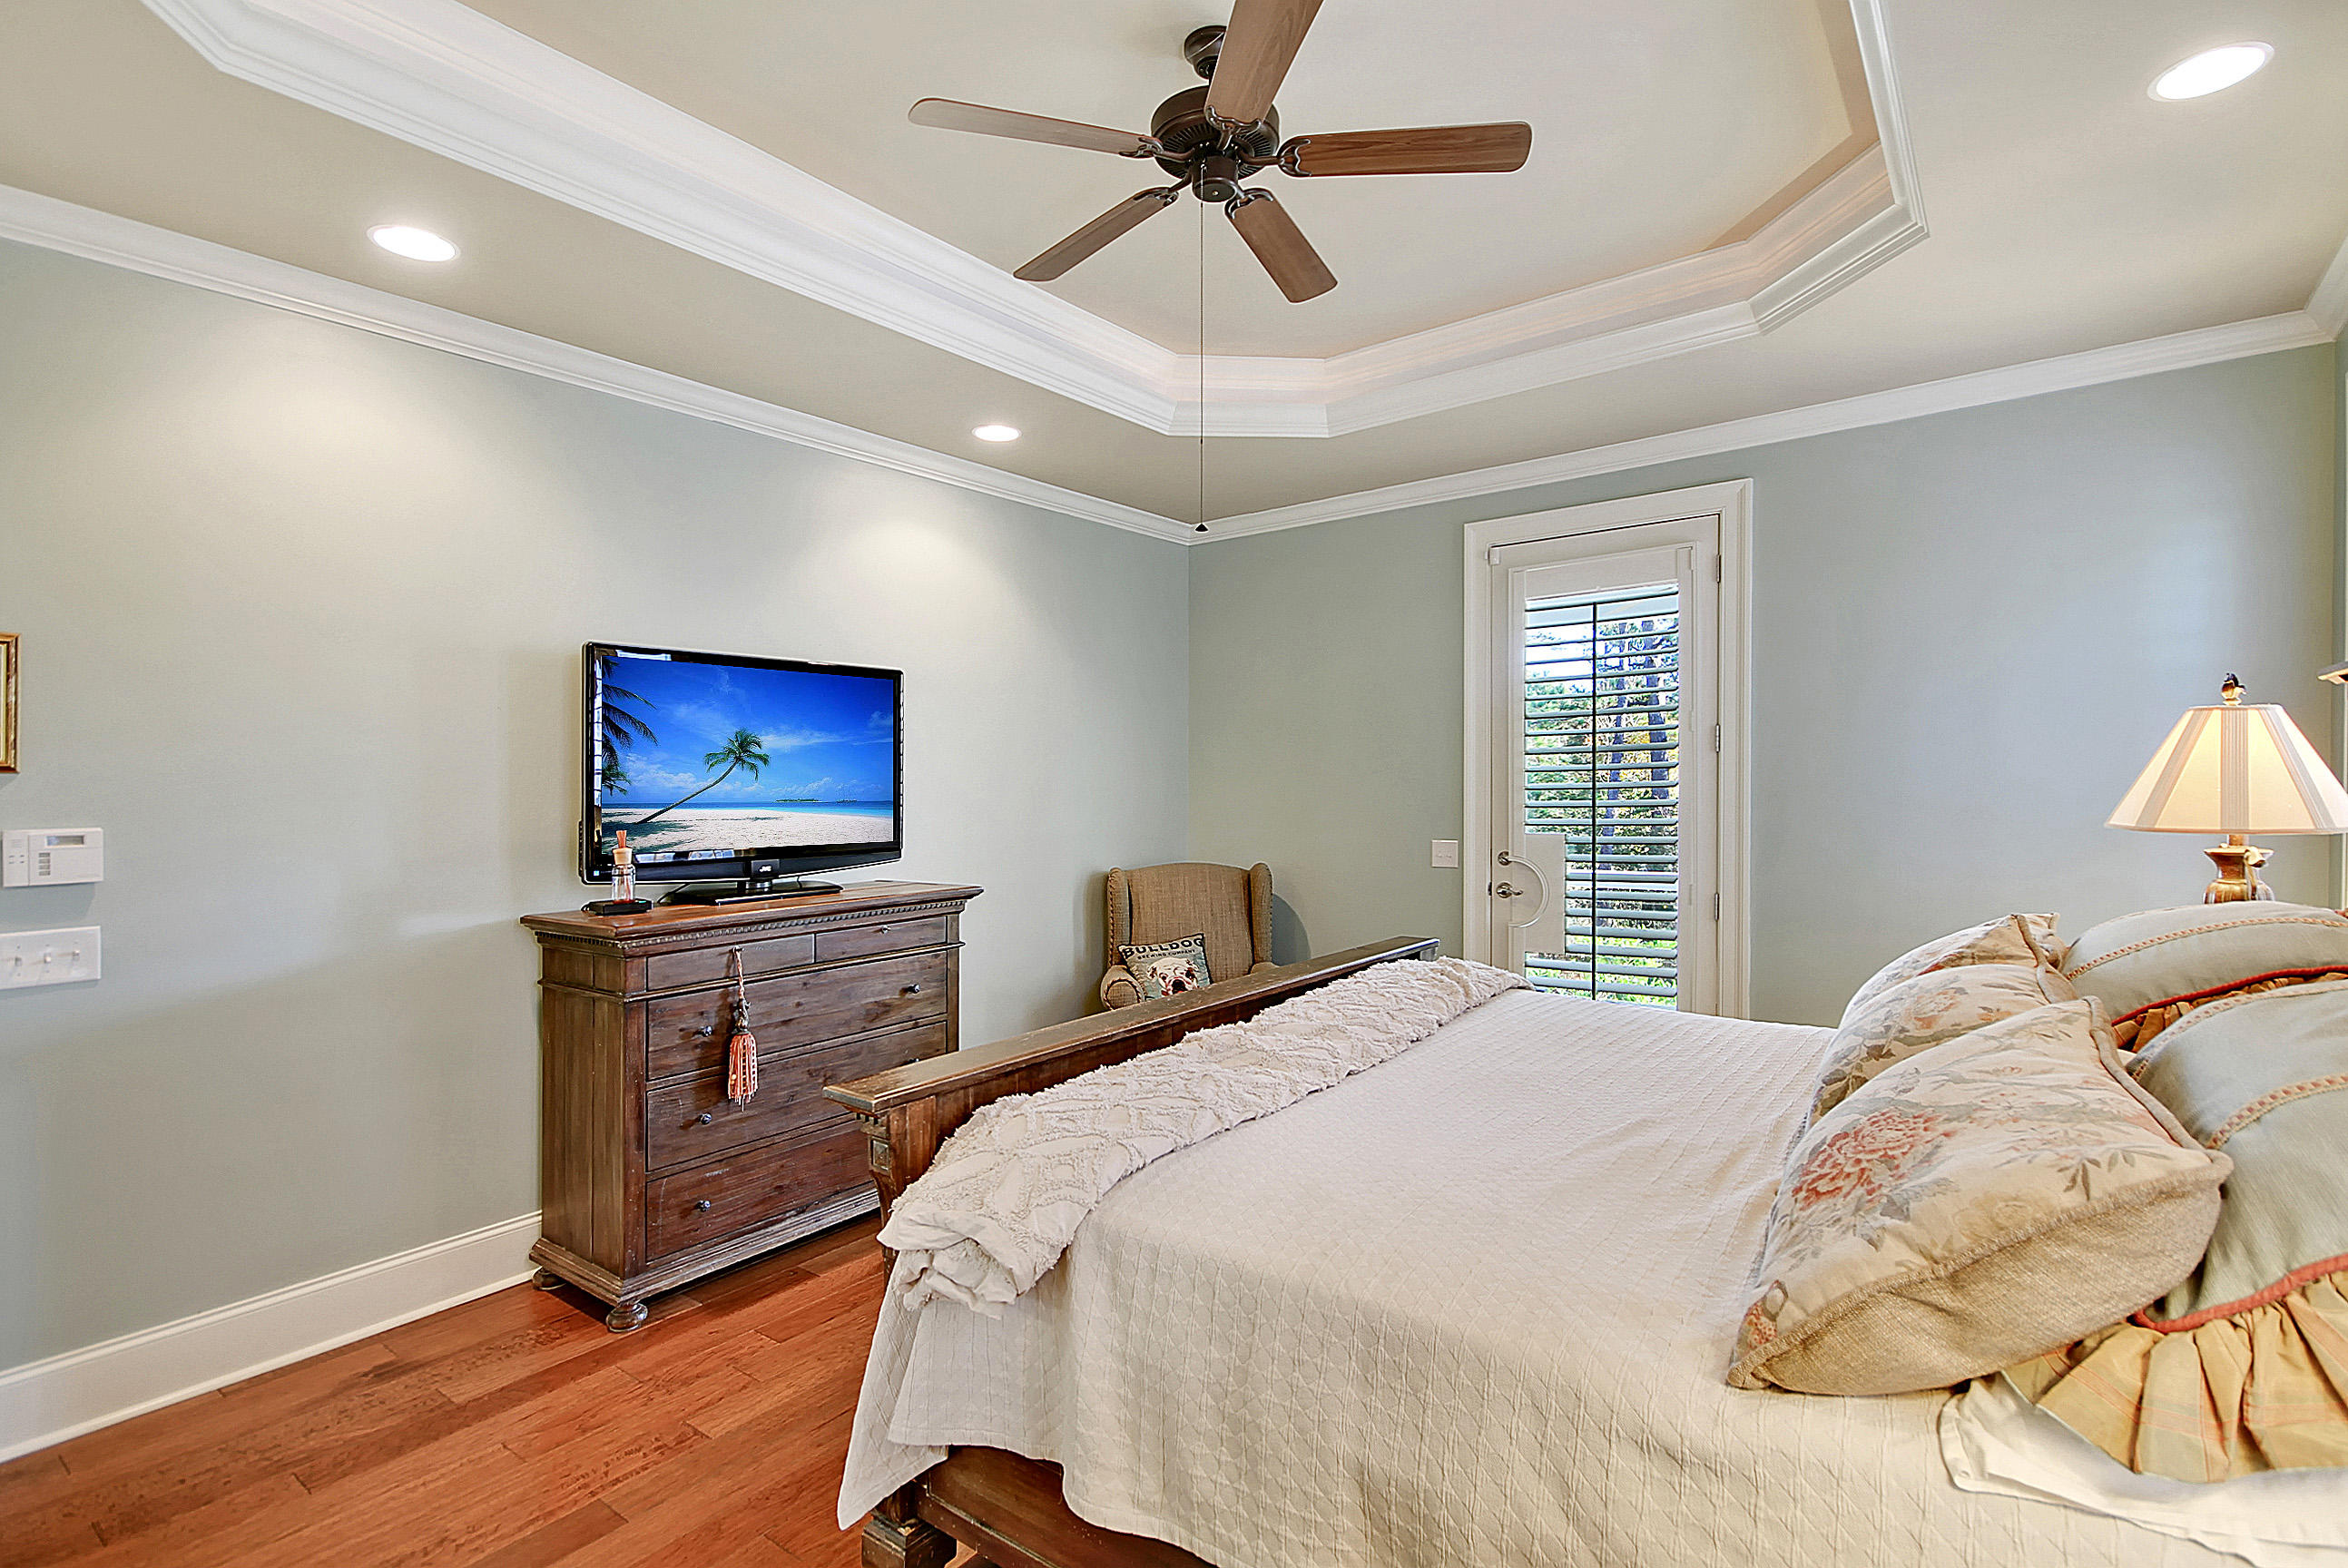 Rivertowne Country Club Homes For Sale - 2601 Kiln Creek, Mount Pleasant, SC - 59